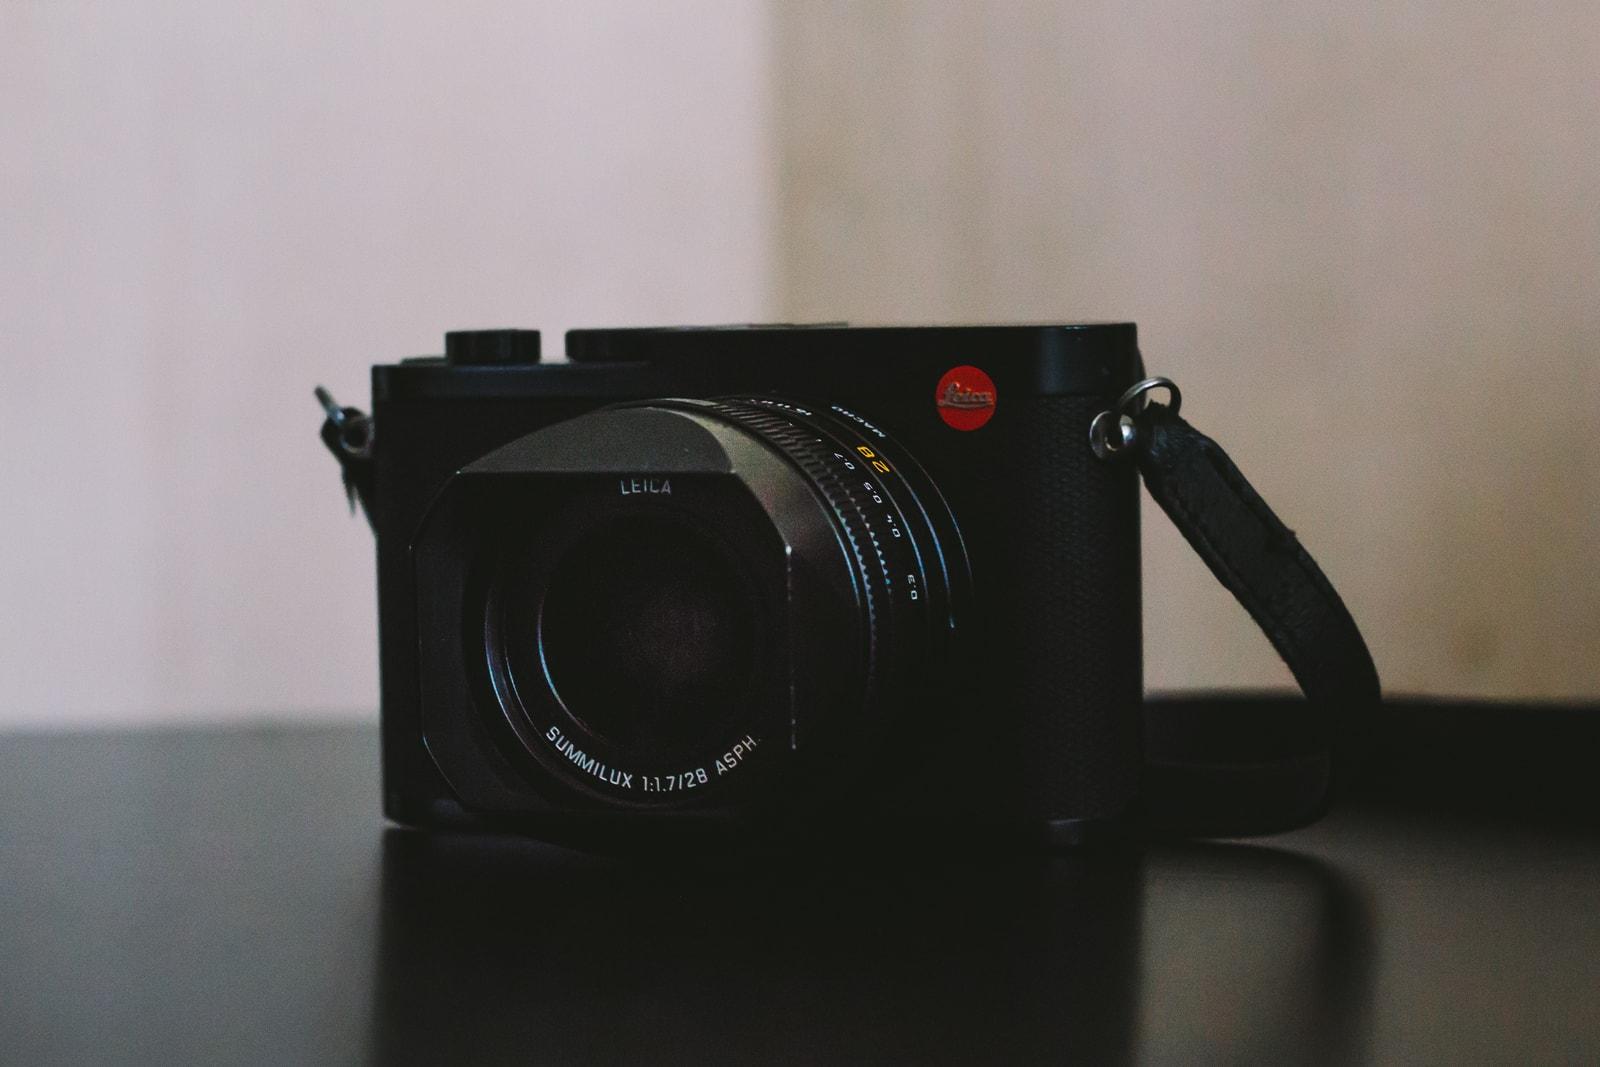 leica q2 camera photography review tech